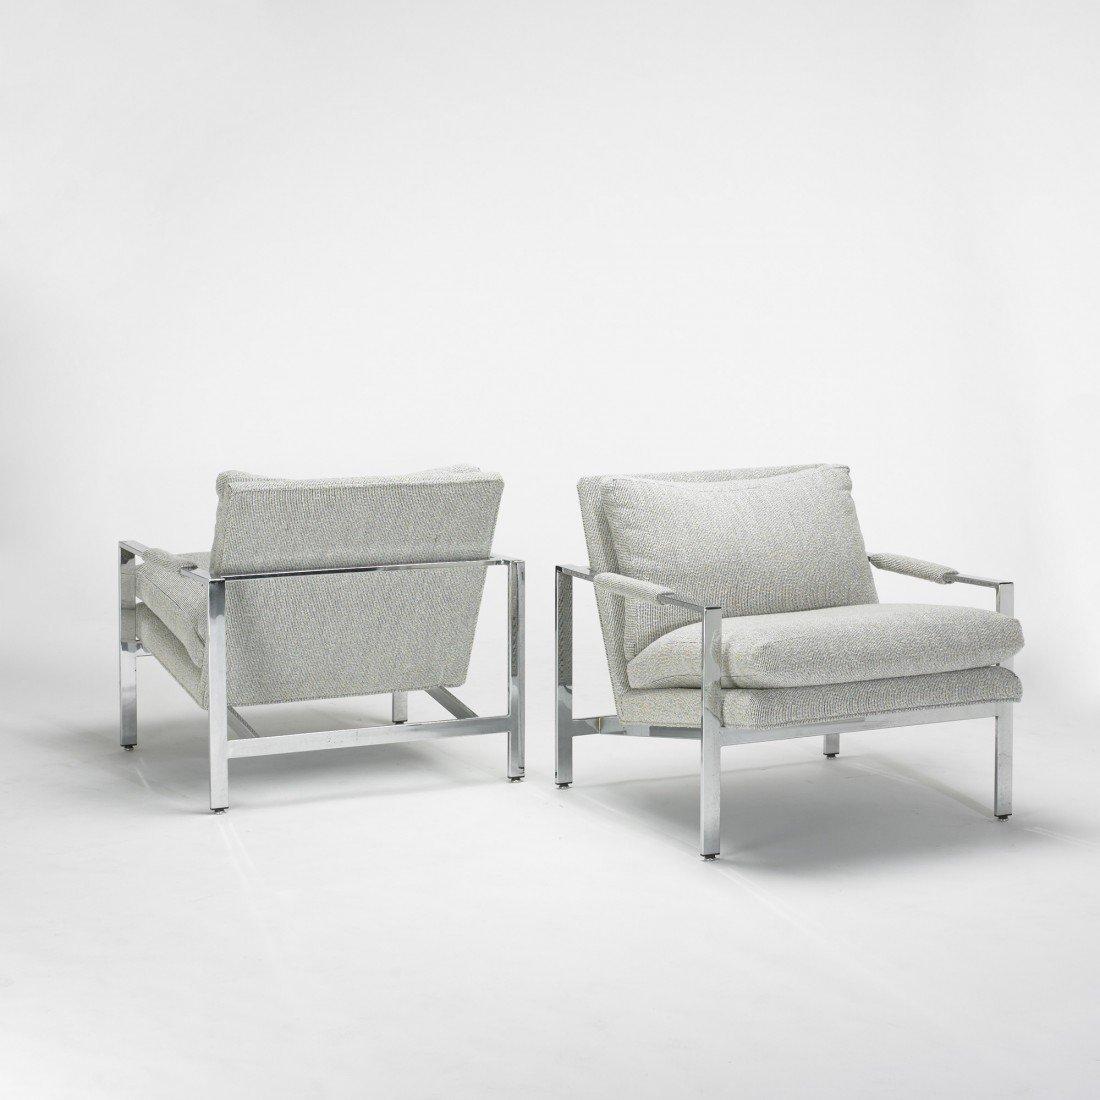 142: Milo Baughman lounge chairs, pair